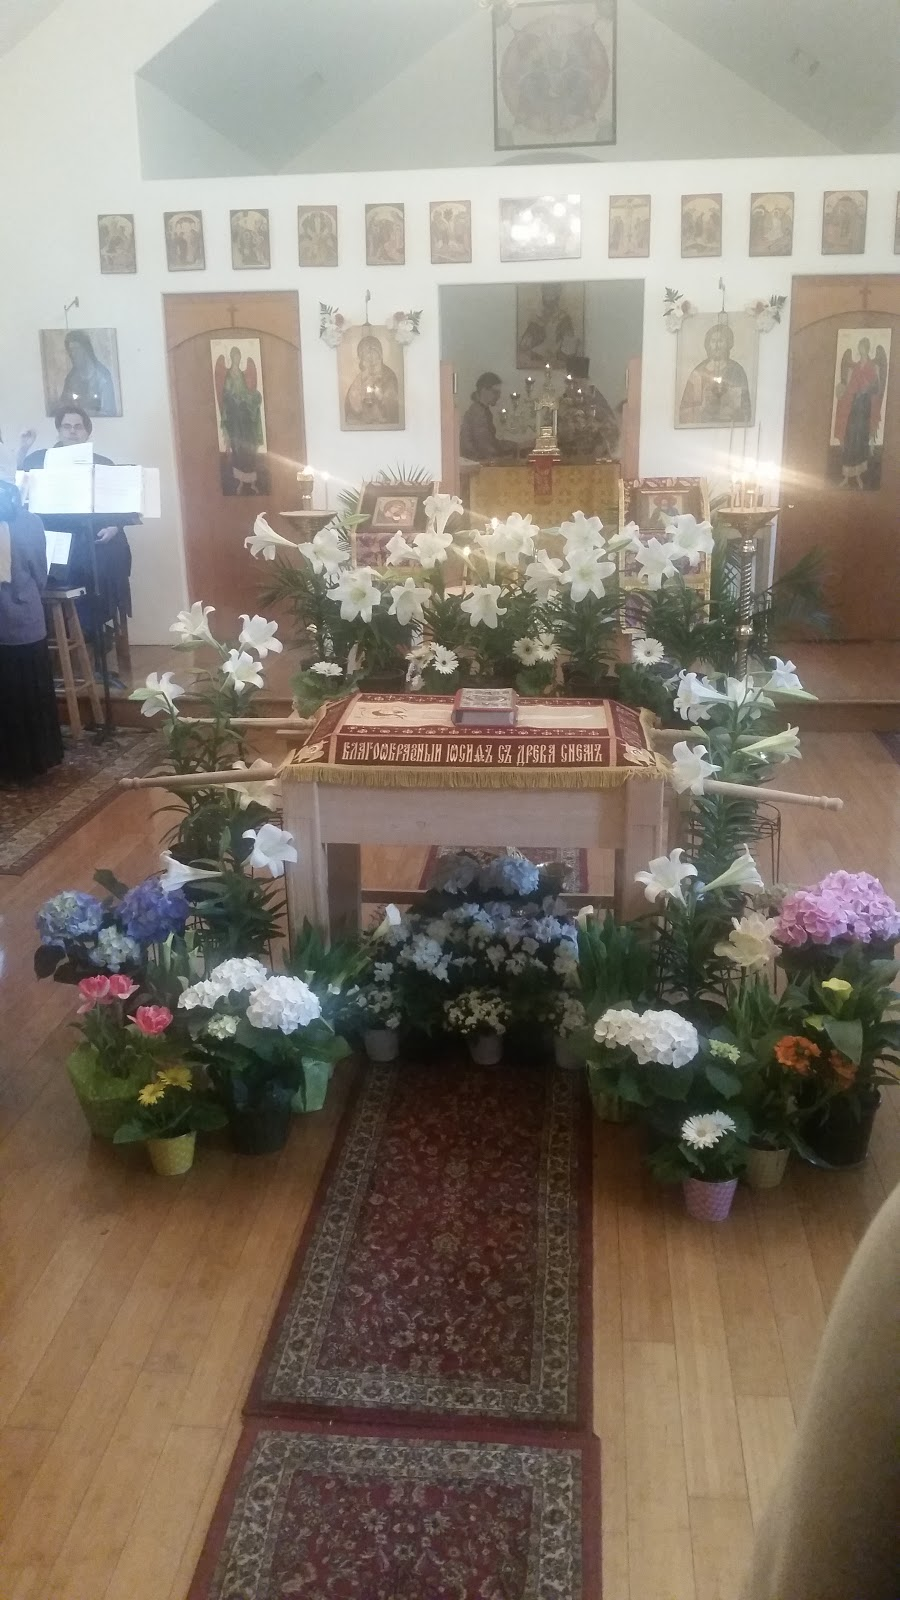 St. Nicholas Russian Orthodox Church - church    Photo 3 of 9   Address: 708 S Chestnut St, McKinney, TX 75069, USA   Phone: (972) 658-5433